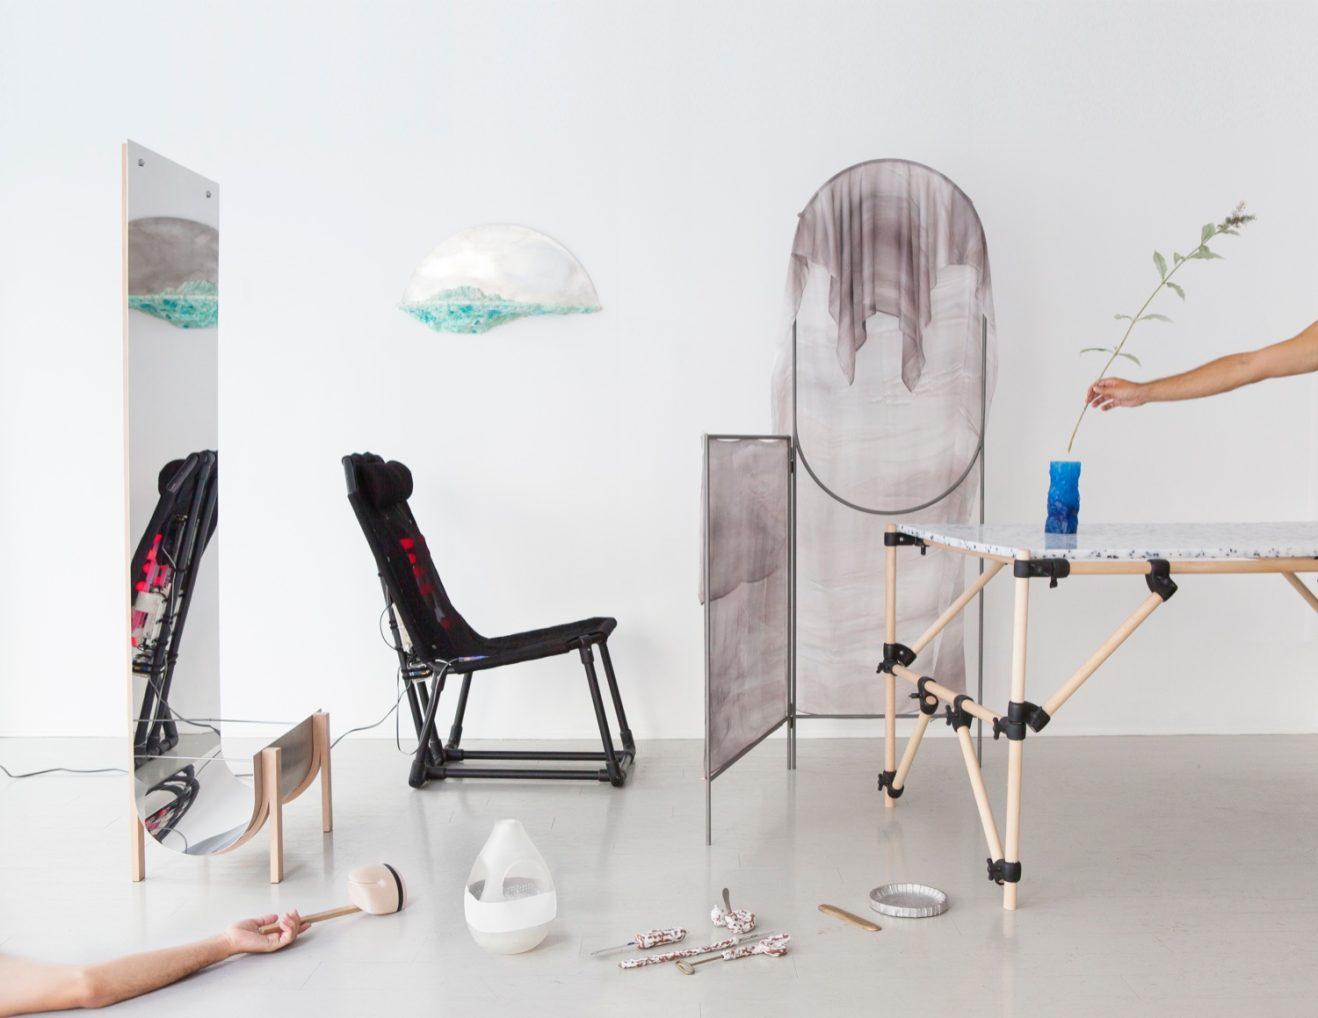 Ensemble-miroir-Frédéric-Saulou-SavannahBay-design2